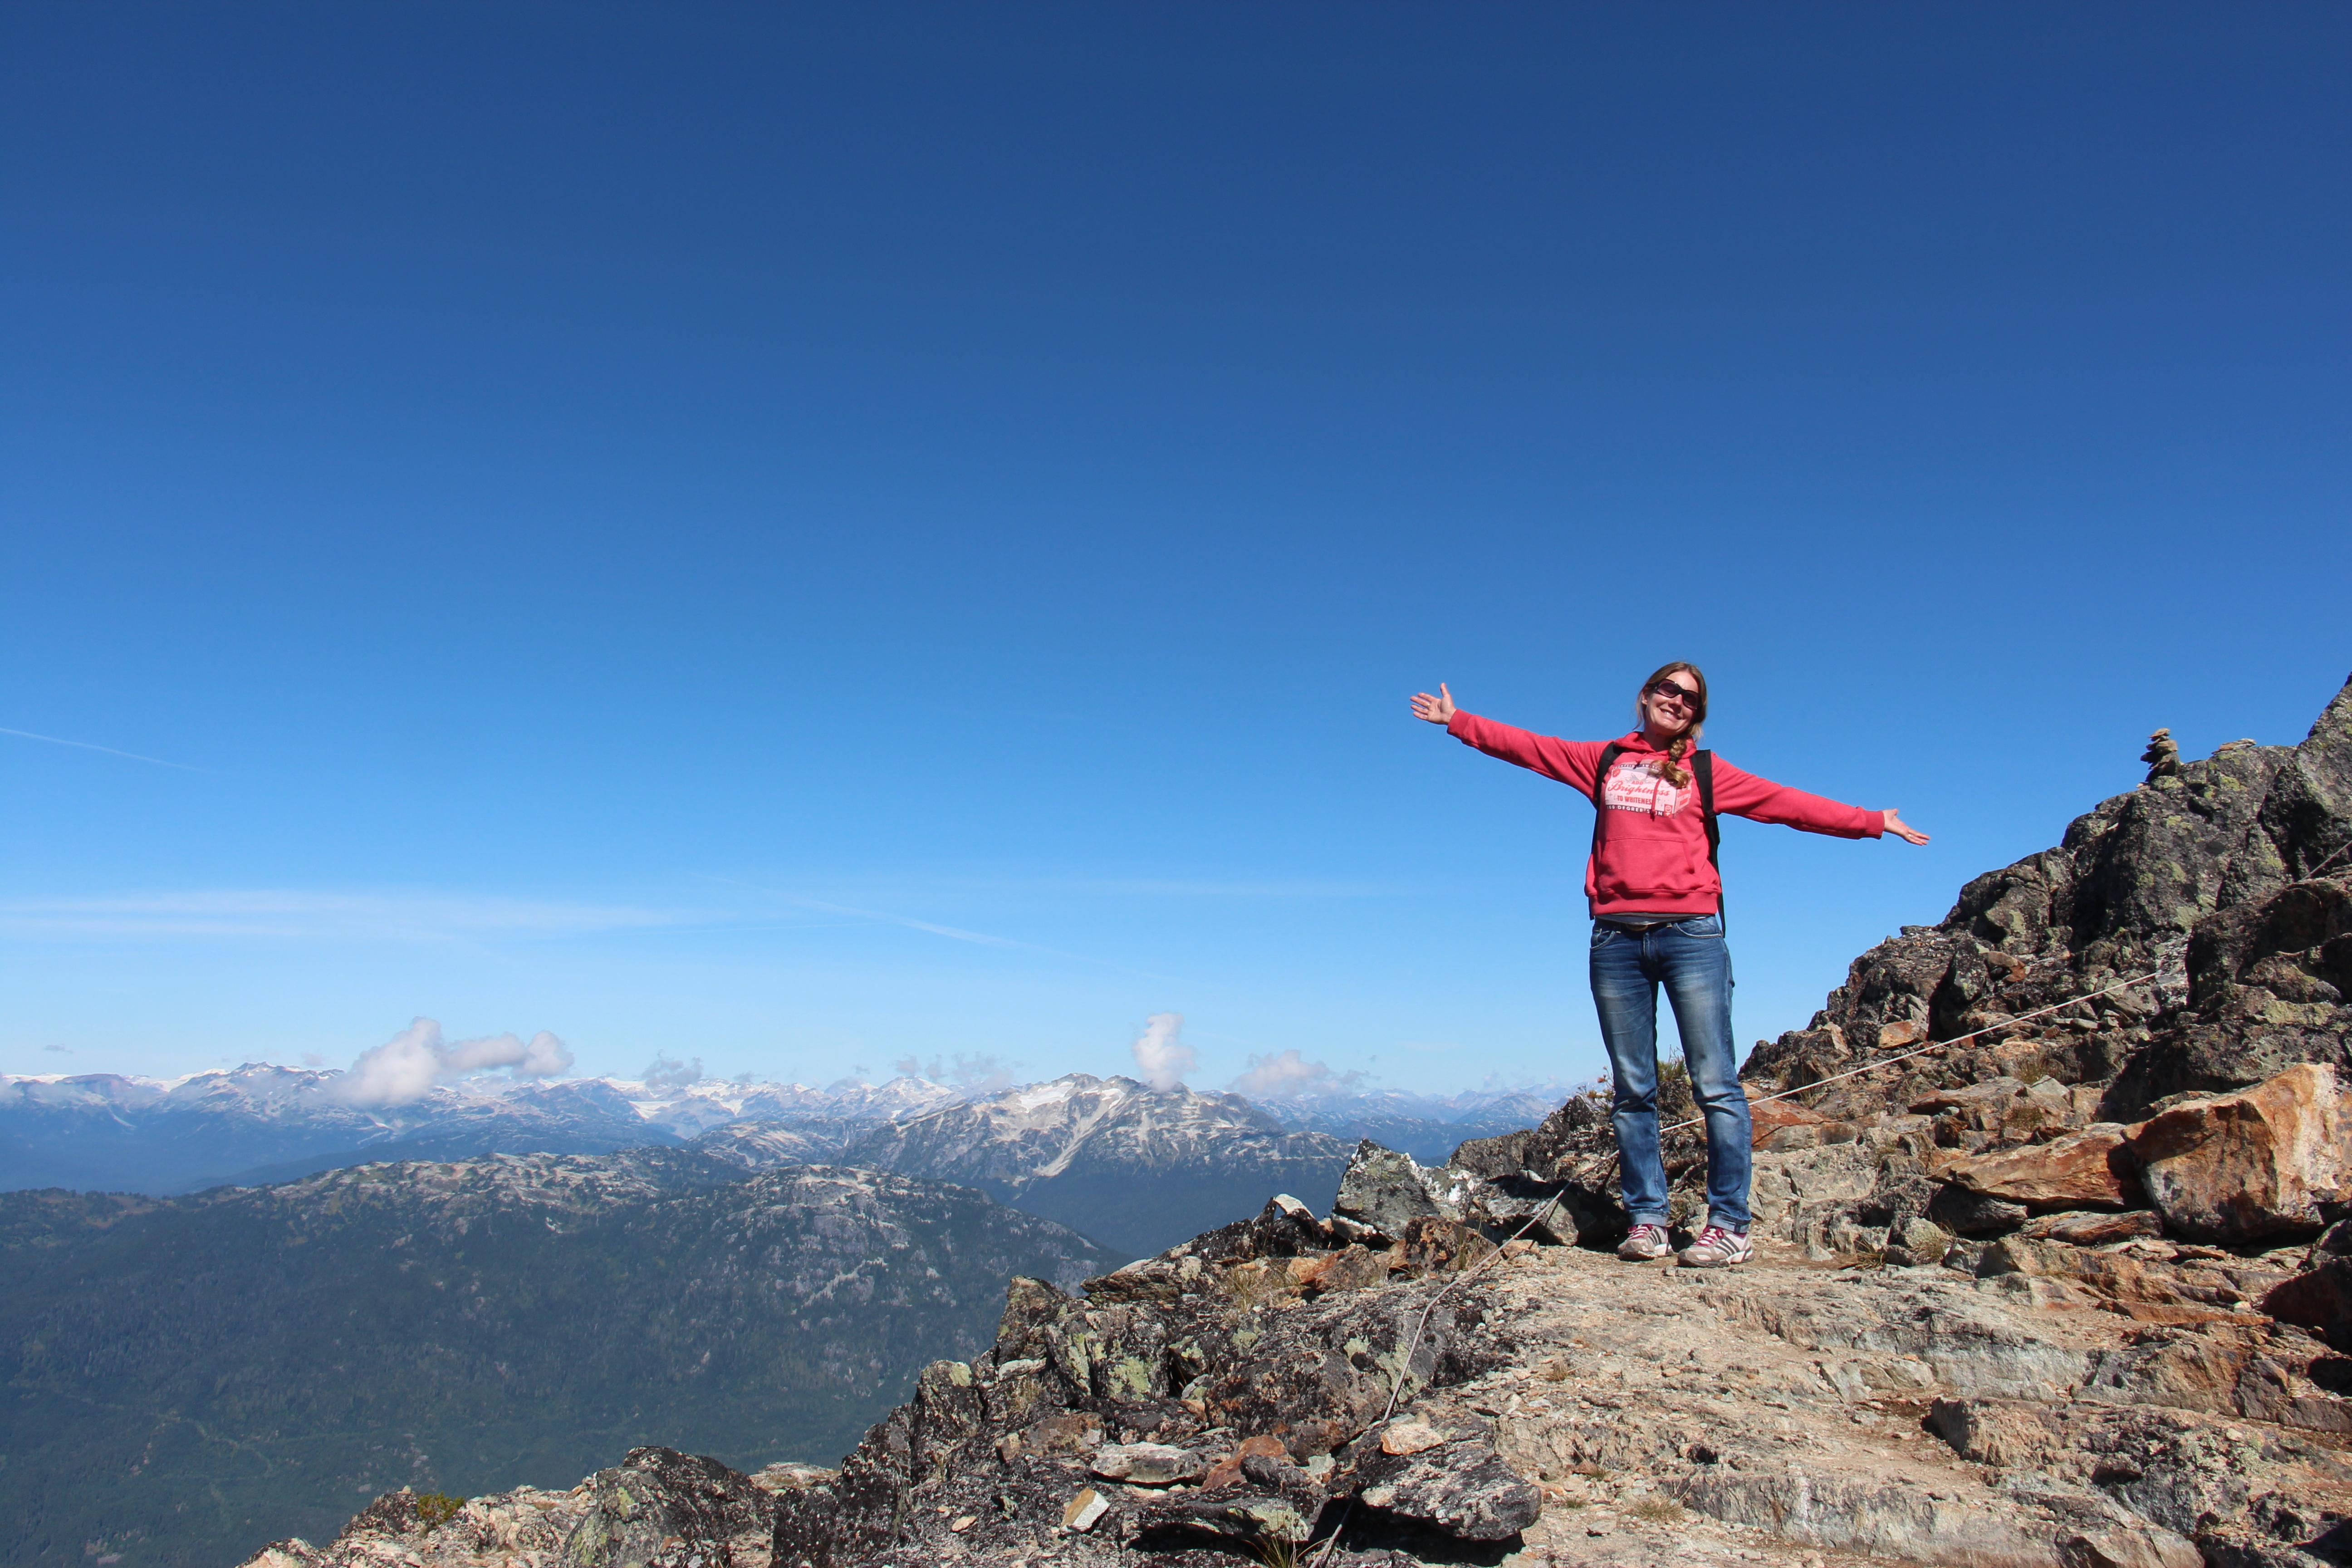 Emma on the mountain